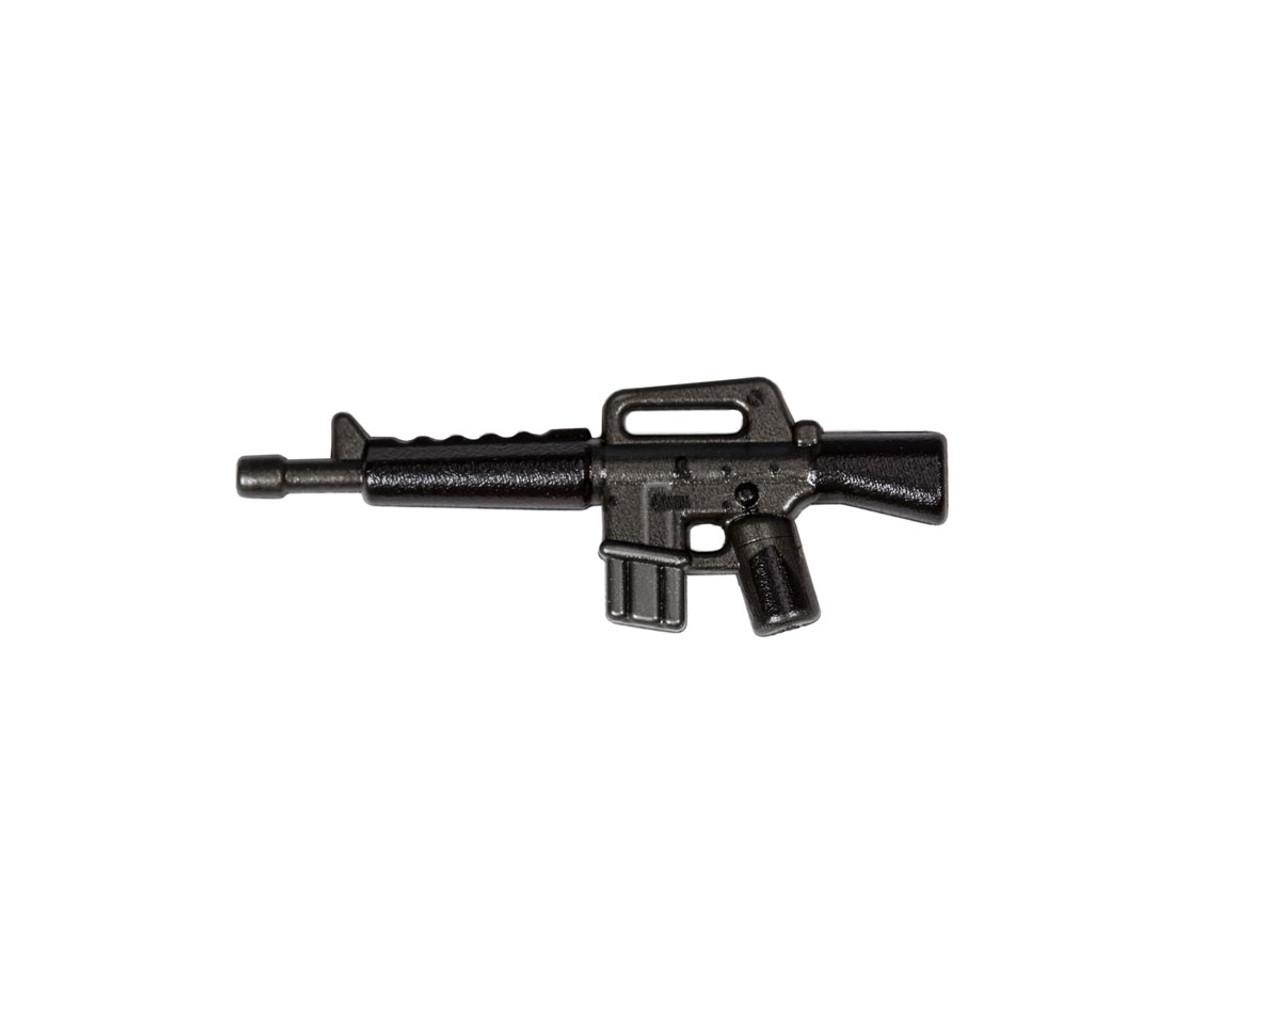 Brickmania® Perfect Caliber™ BrickArms® M16